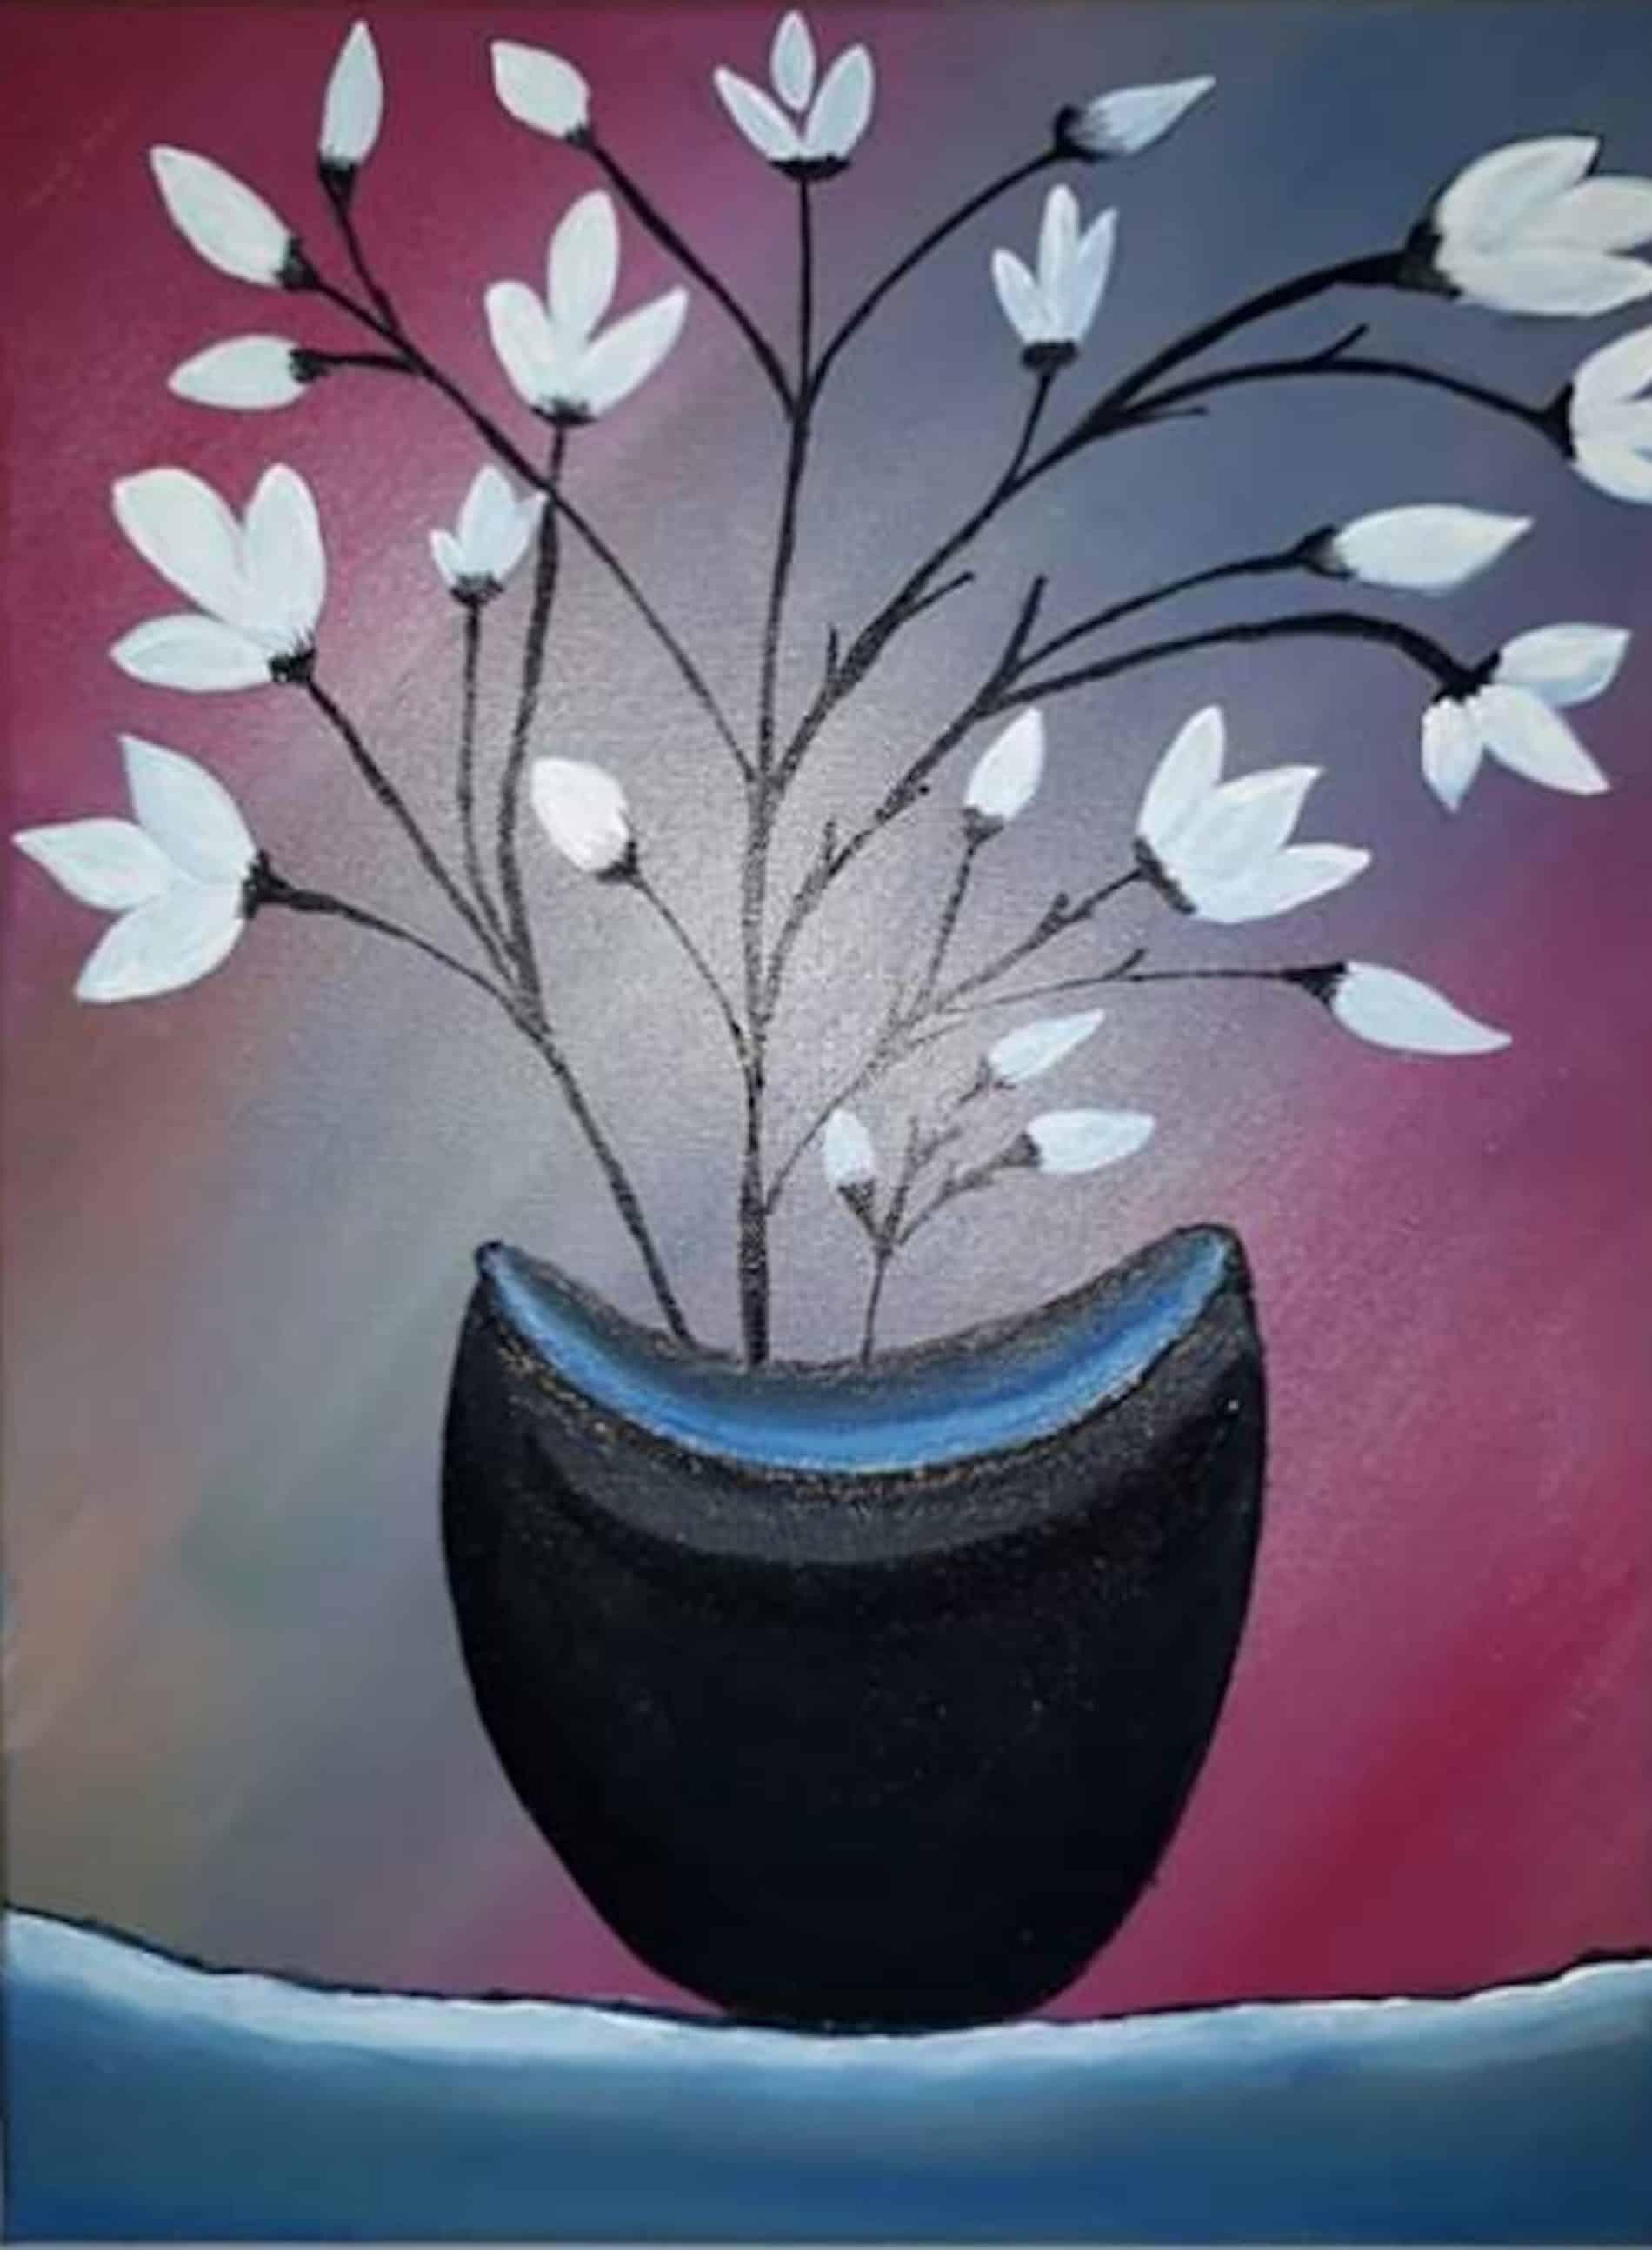 mauritius_arts_juliana_jean_flowerbulb